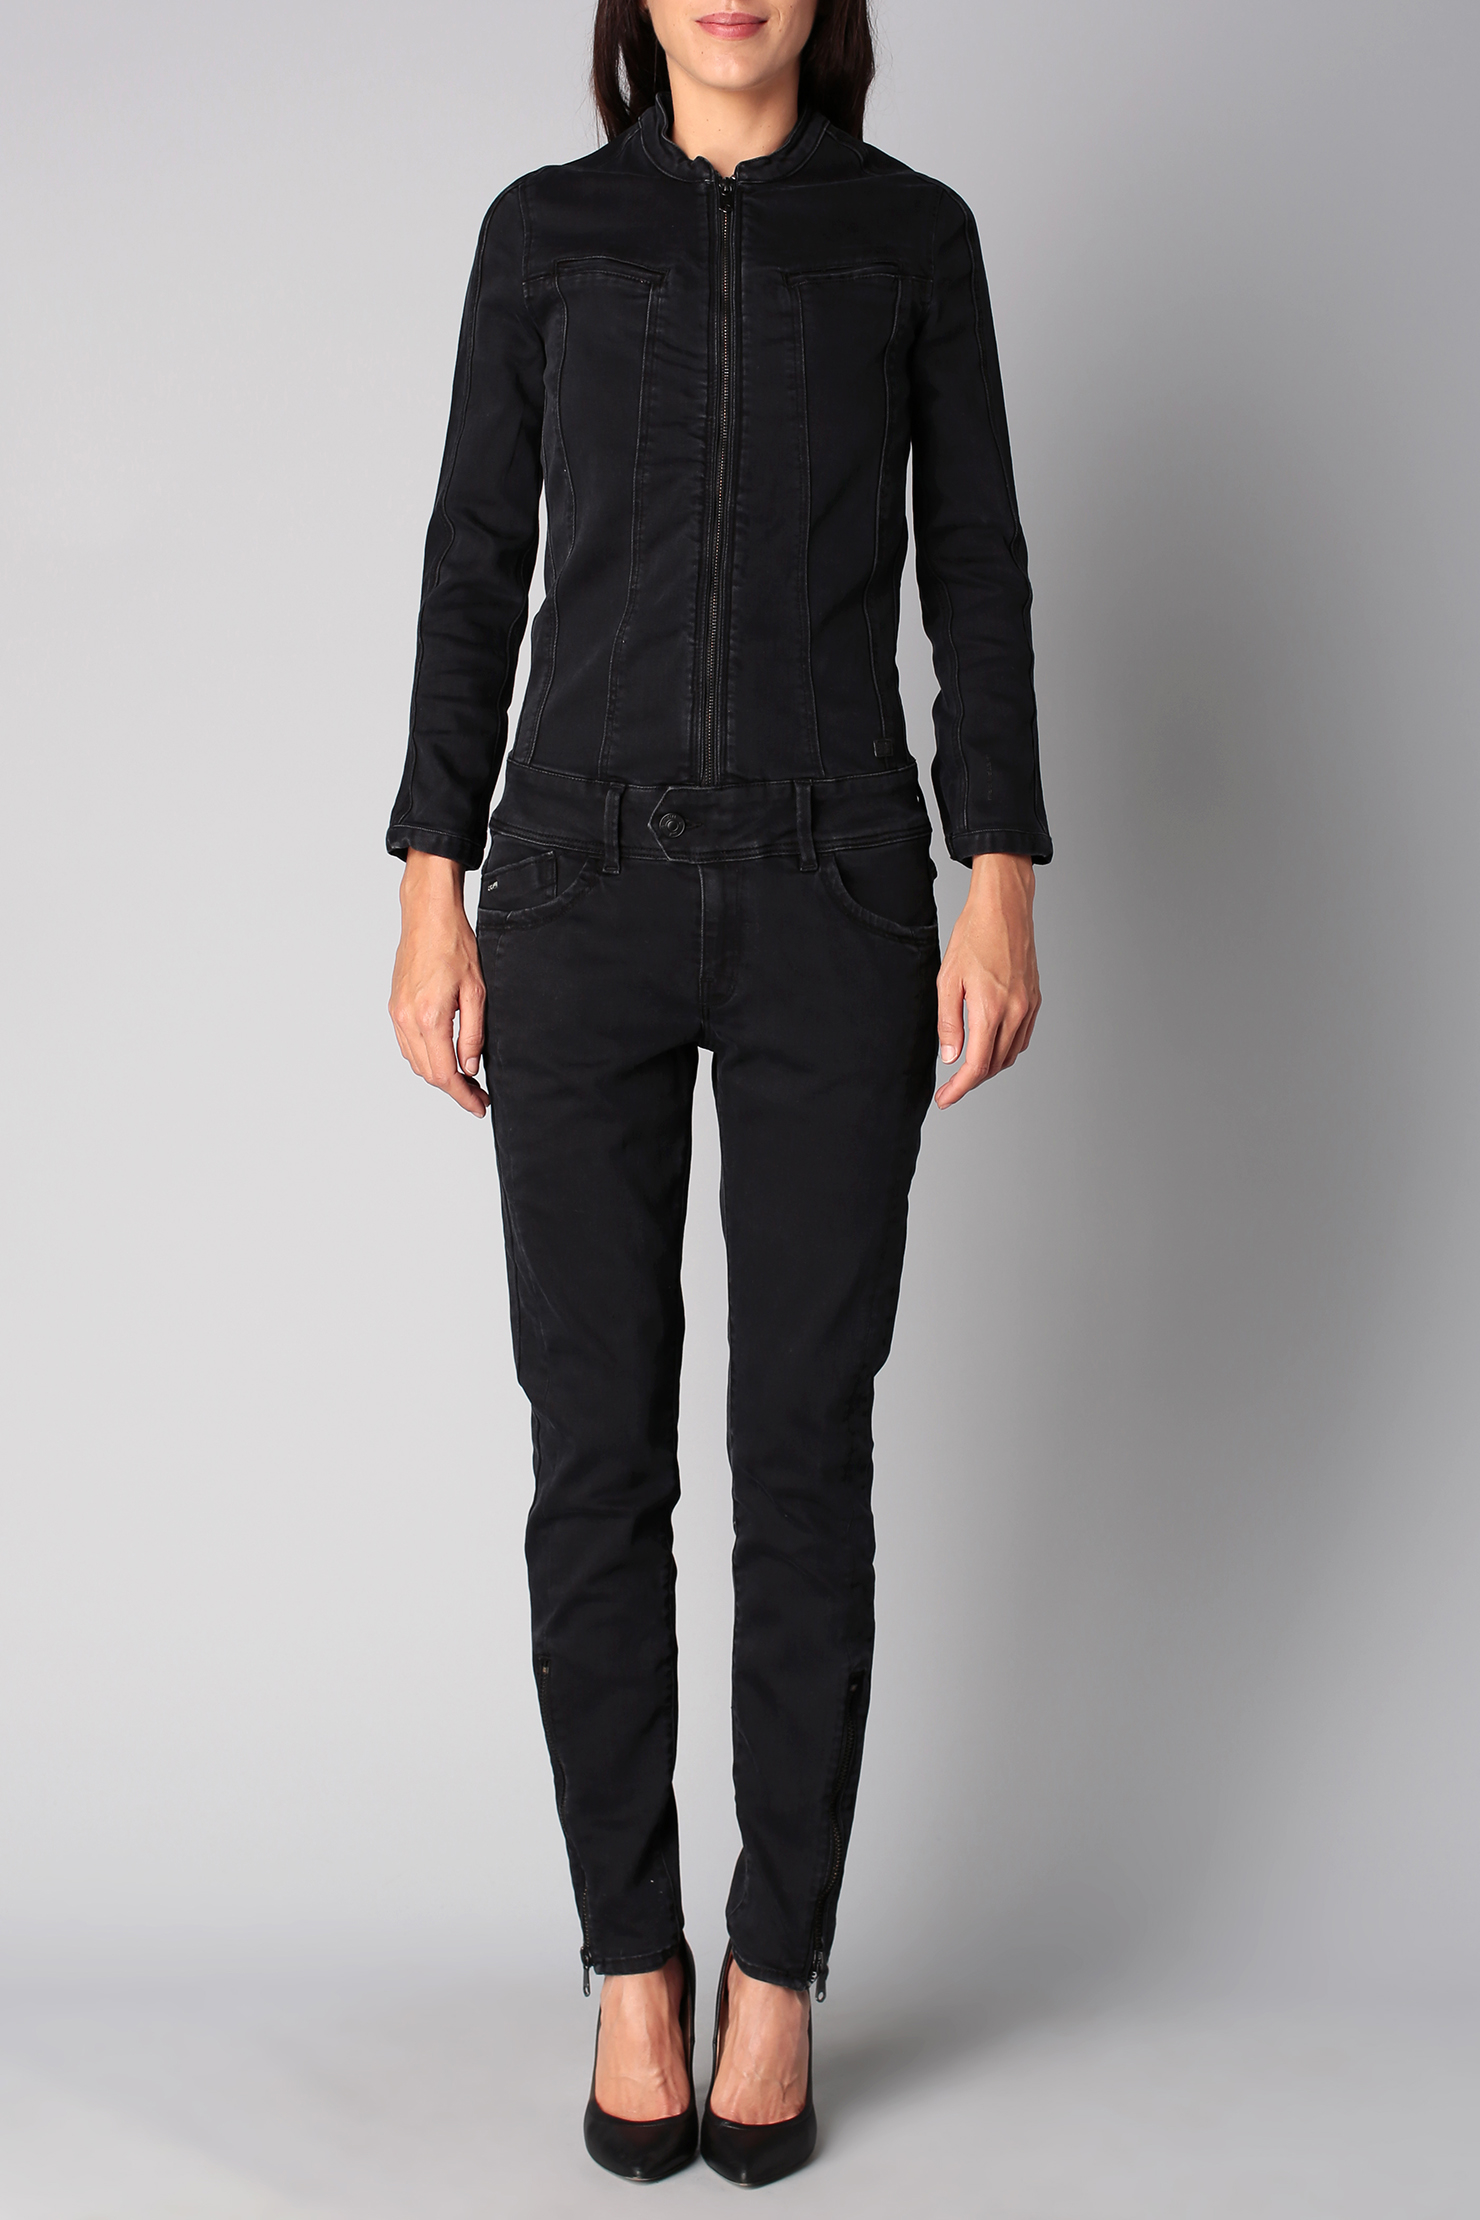 g star raw jumpsuit in black lyst. Black Bedroom Furniture Sets. Home Design Ideas